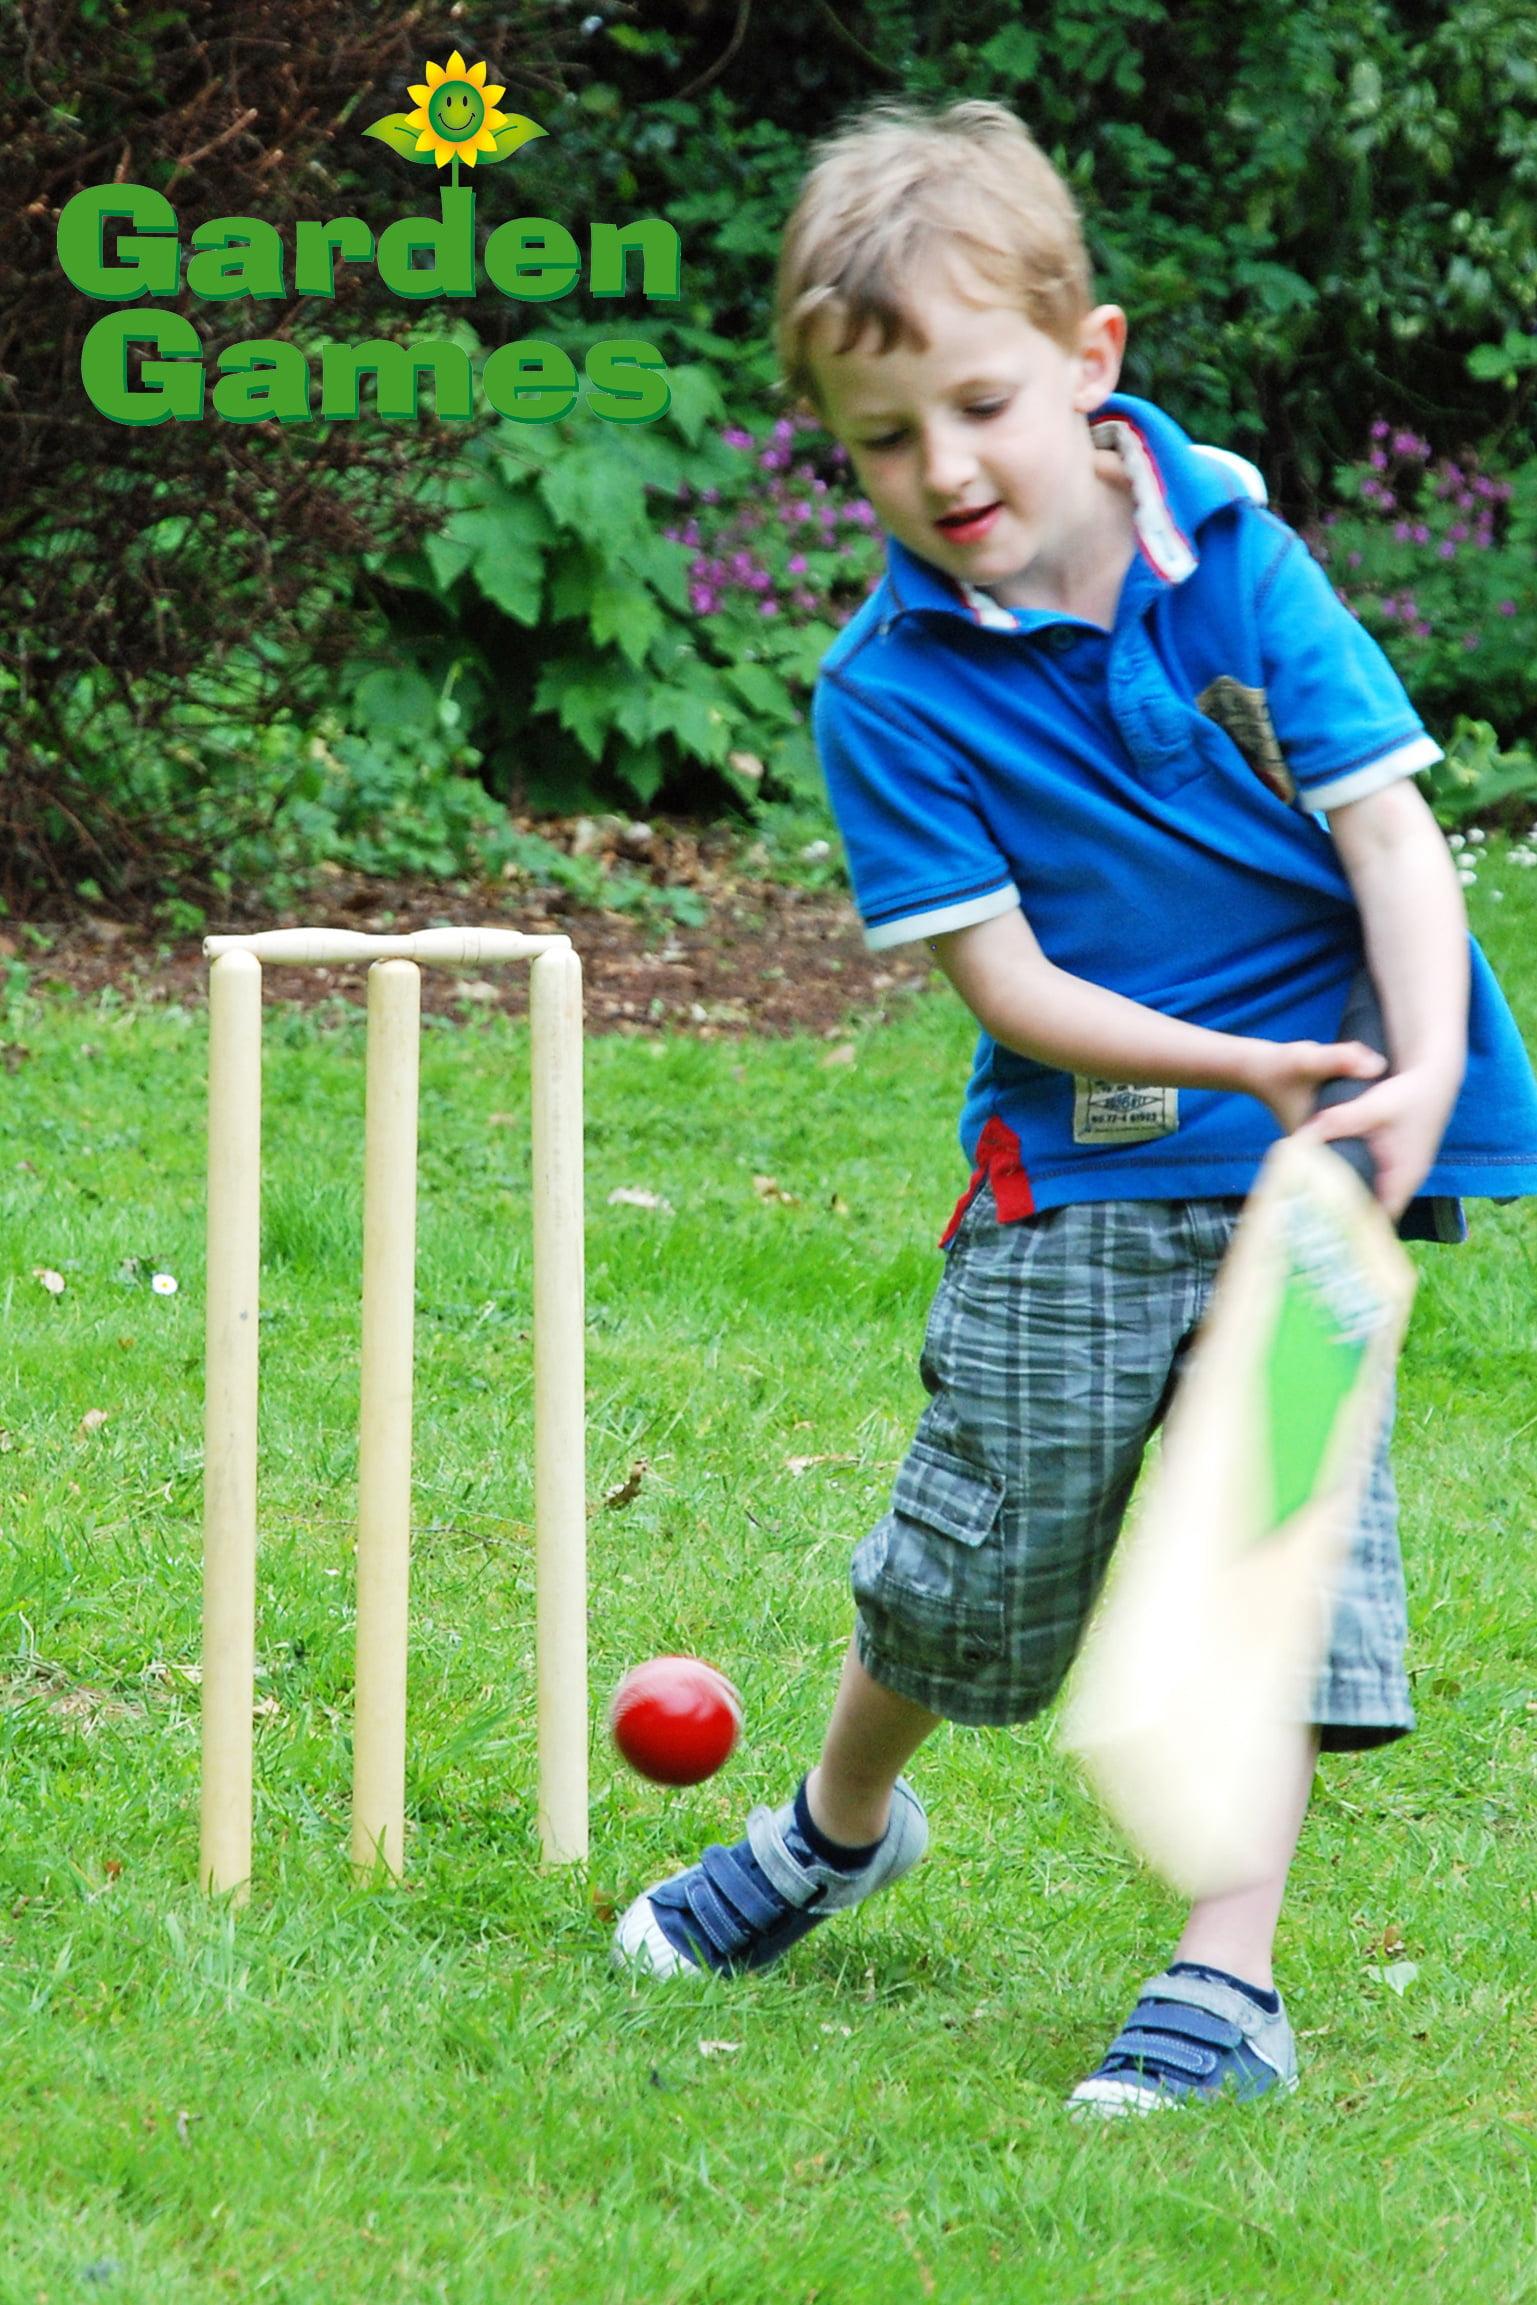 Adventure Zone Toys Garden Games Cricket Set